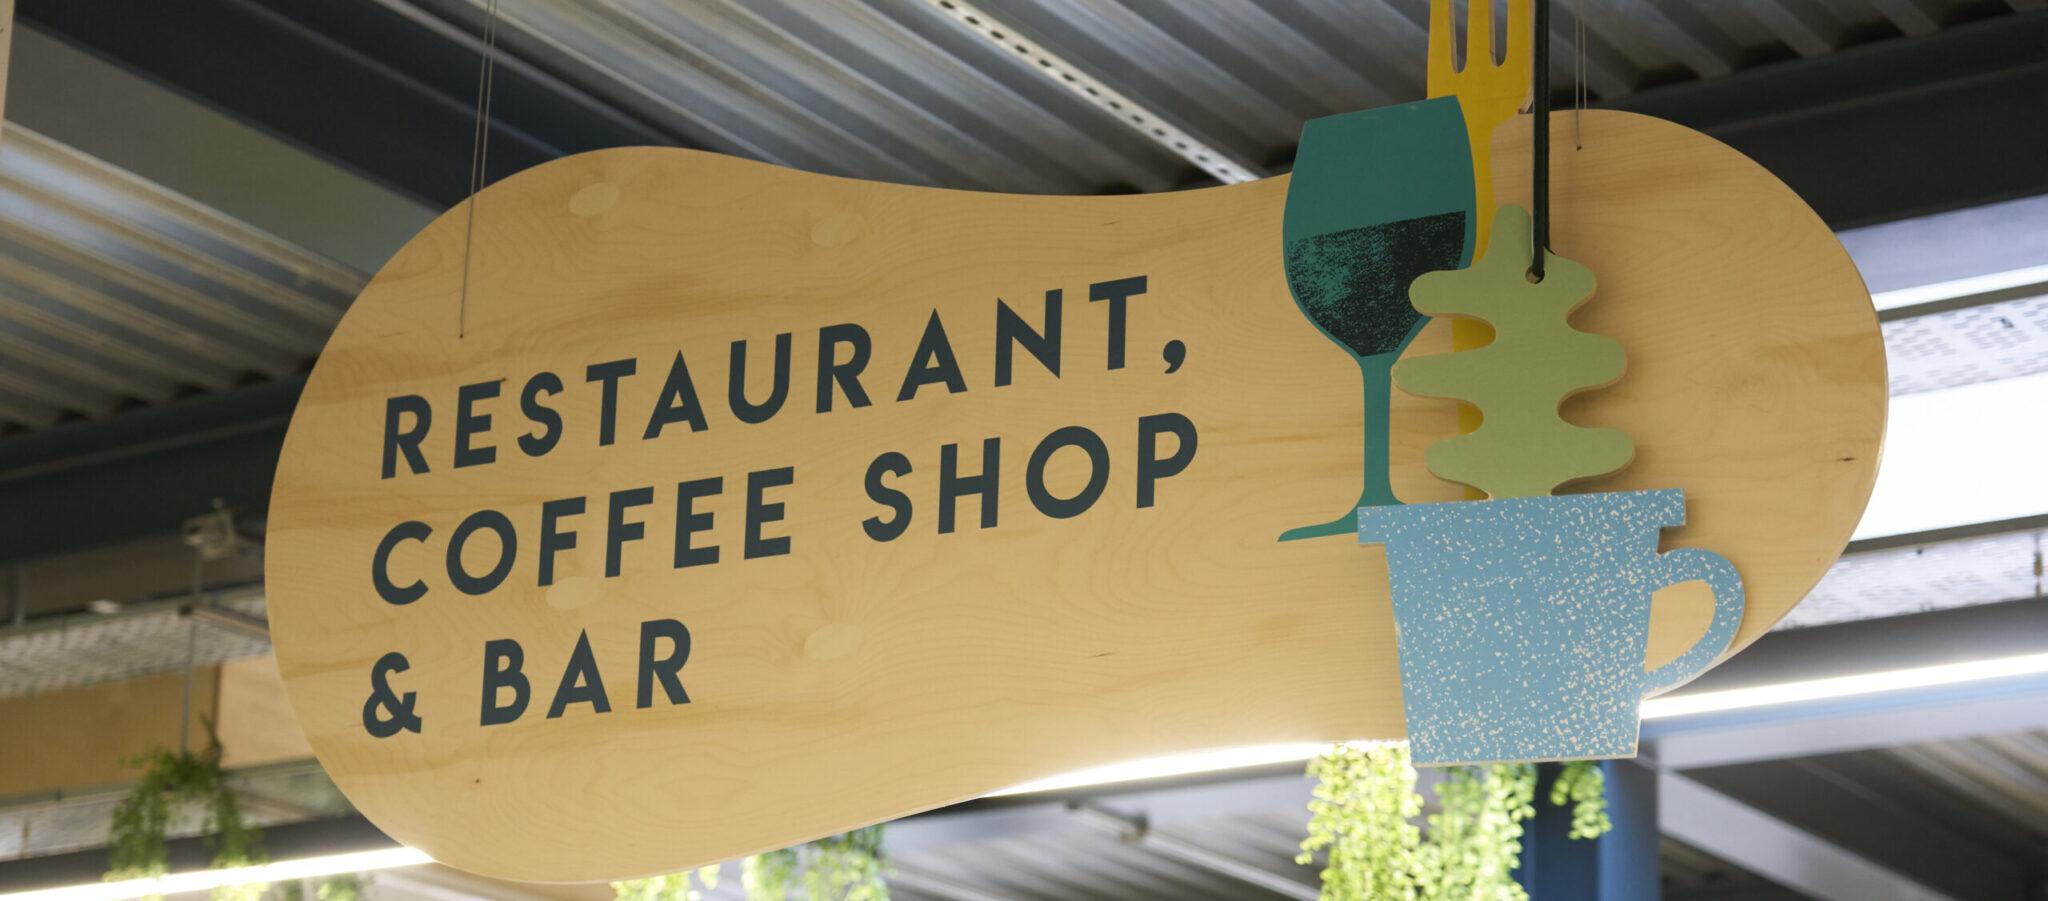 restaurant , coffee shop & bar sign